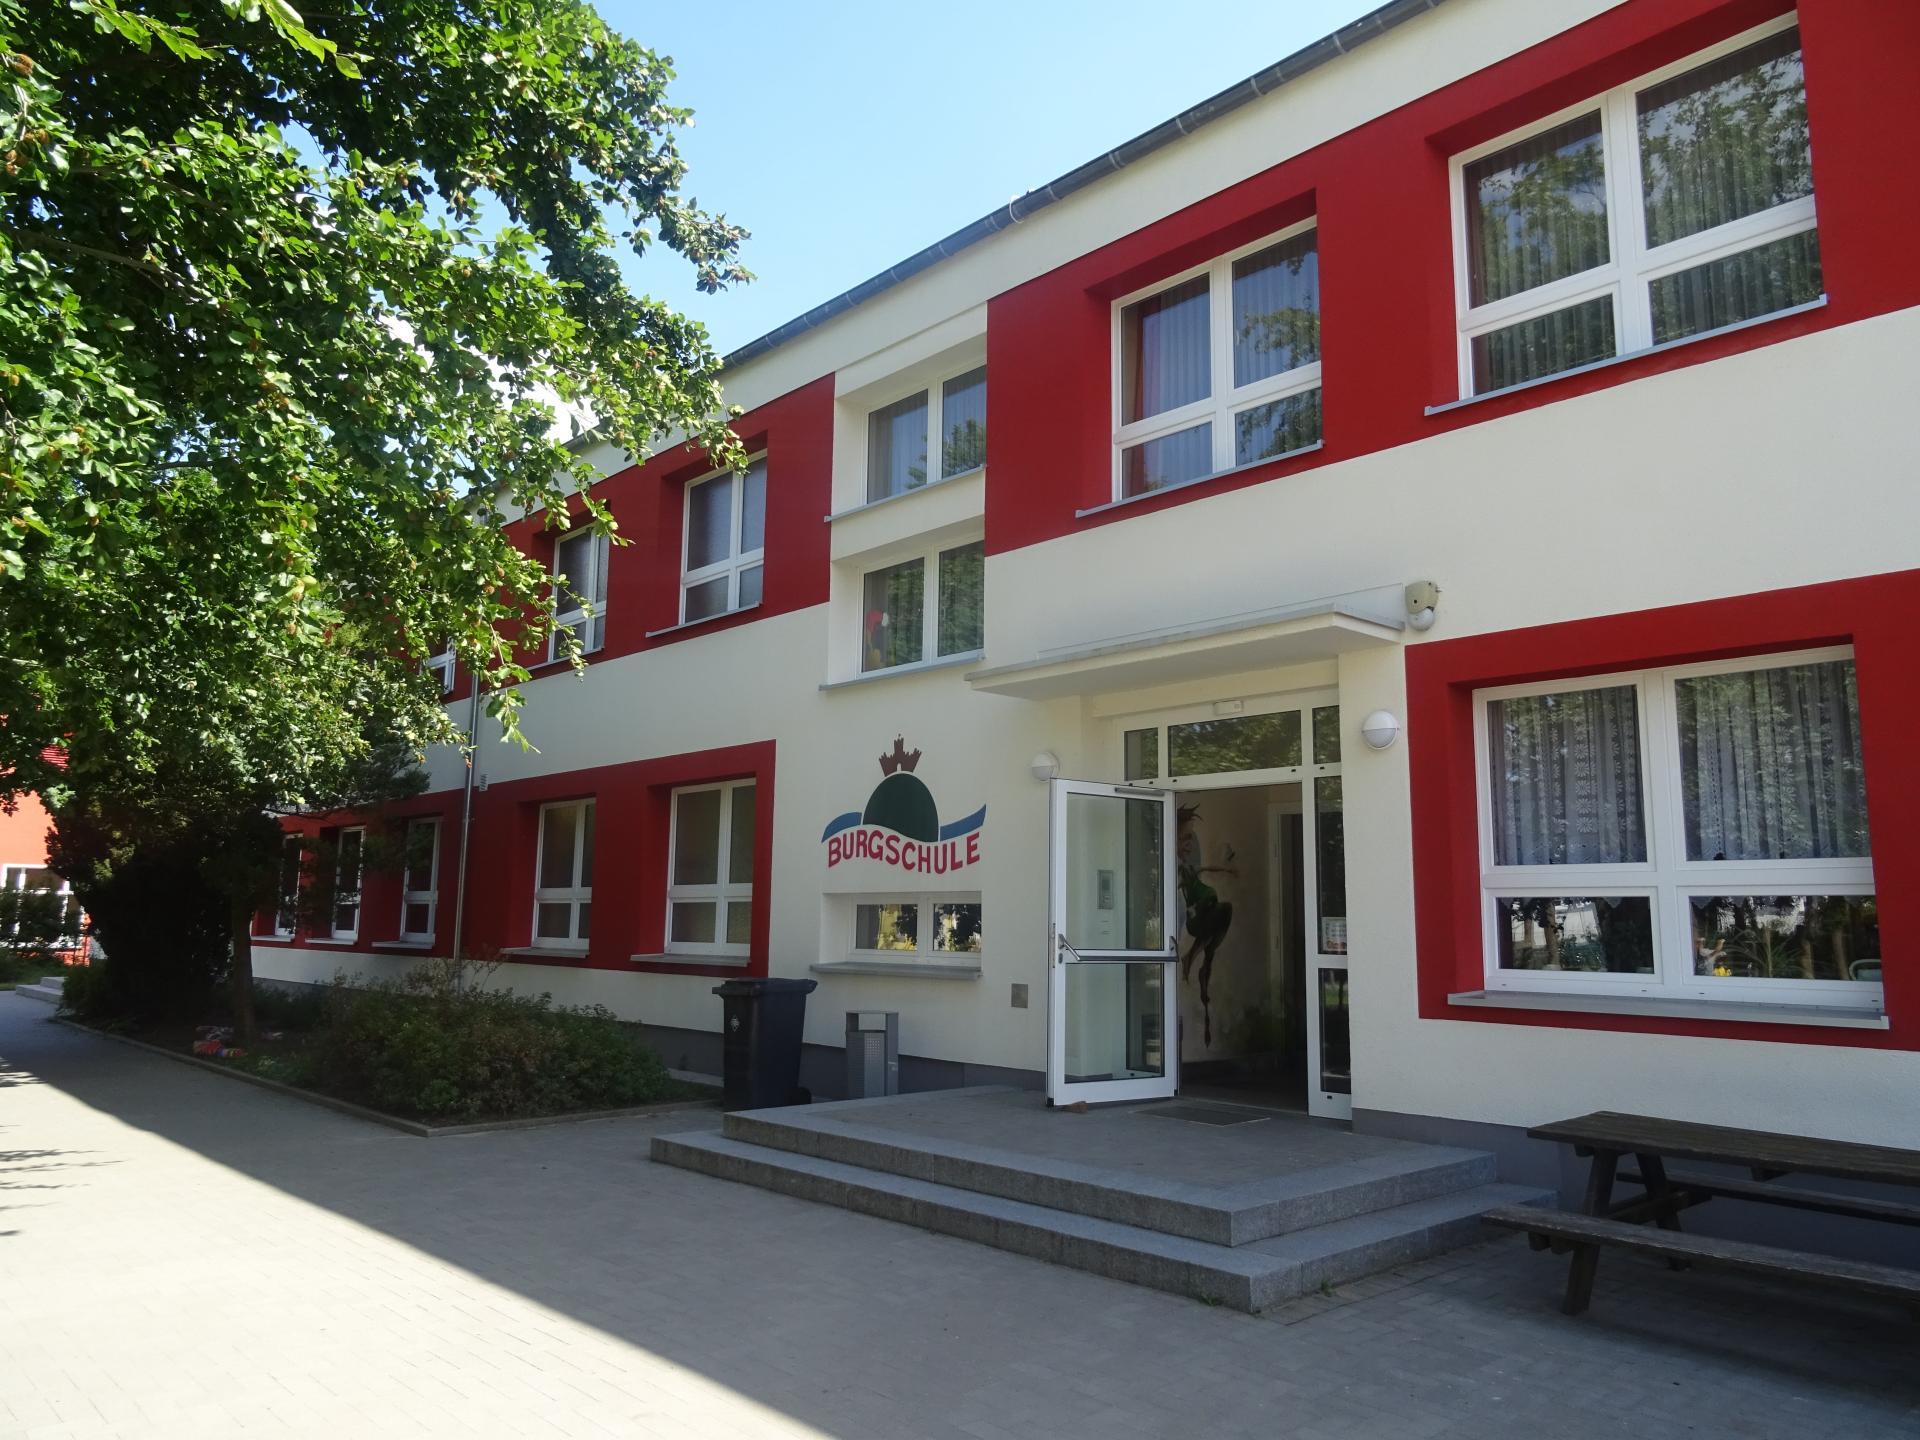 Burgschule  Foto: Info Punkt Lebus